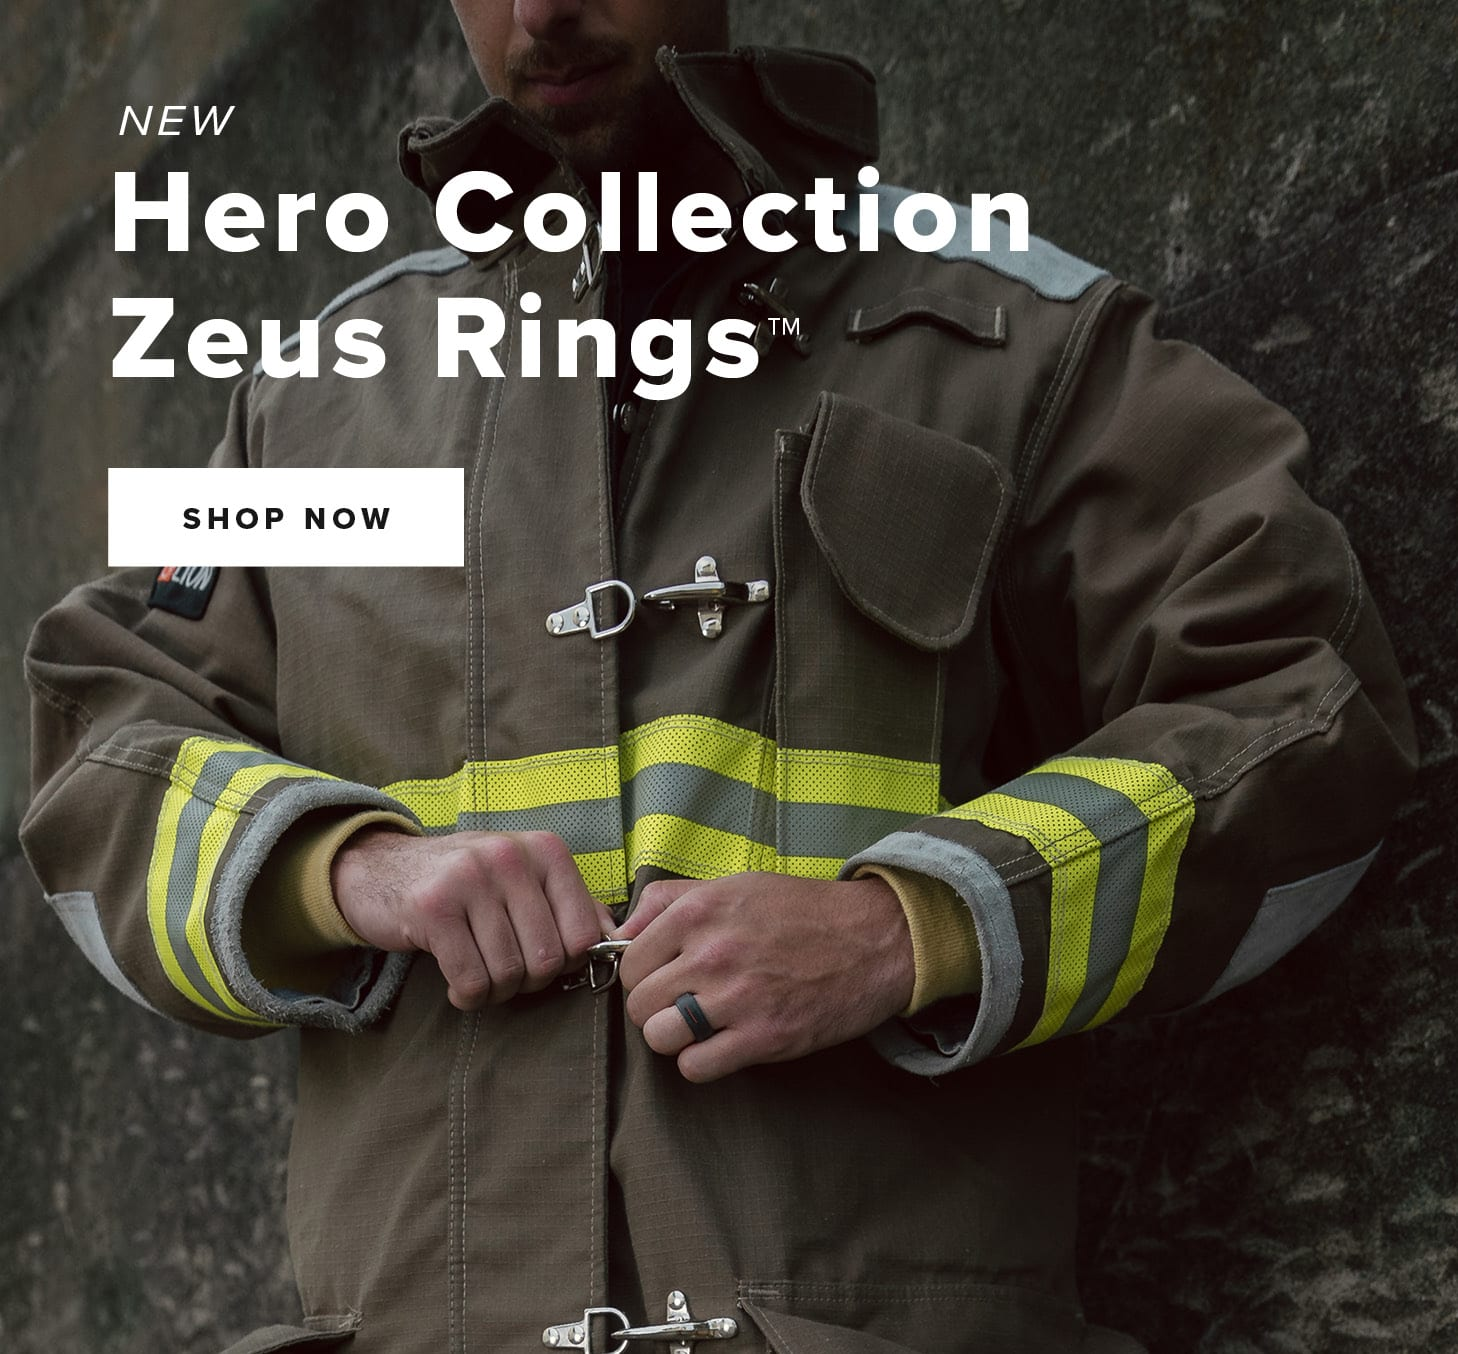 NEW HERO COLLECTION ZEUS RINGS